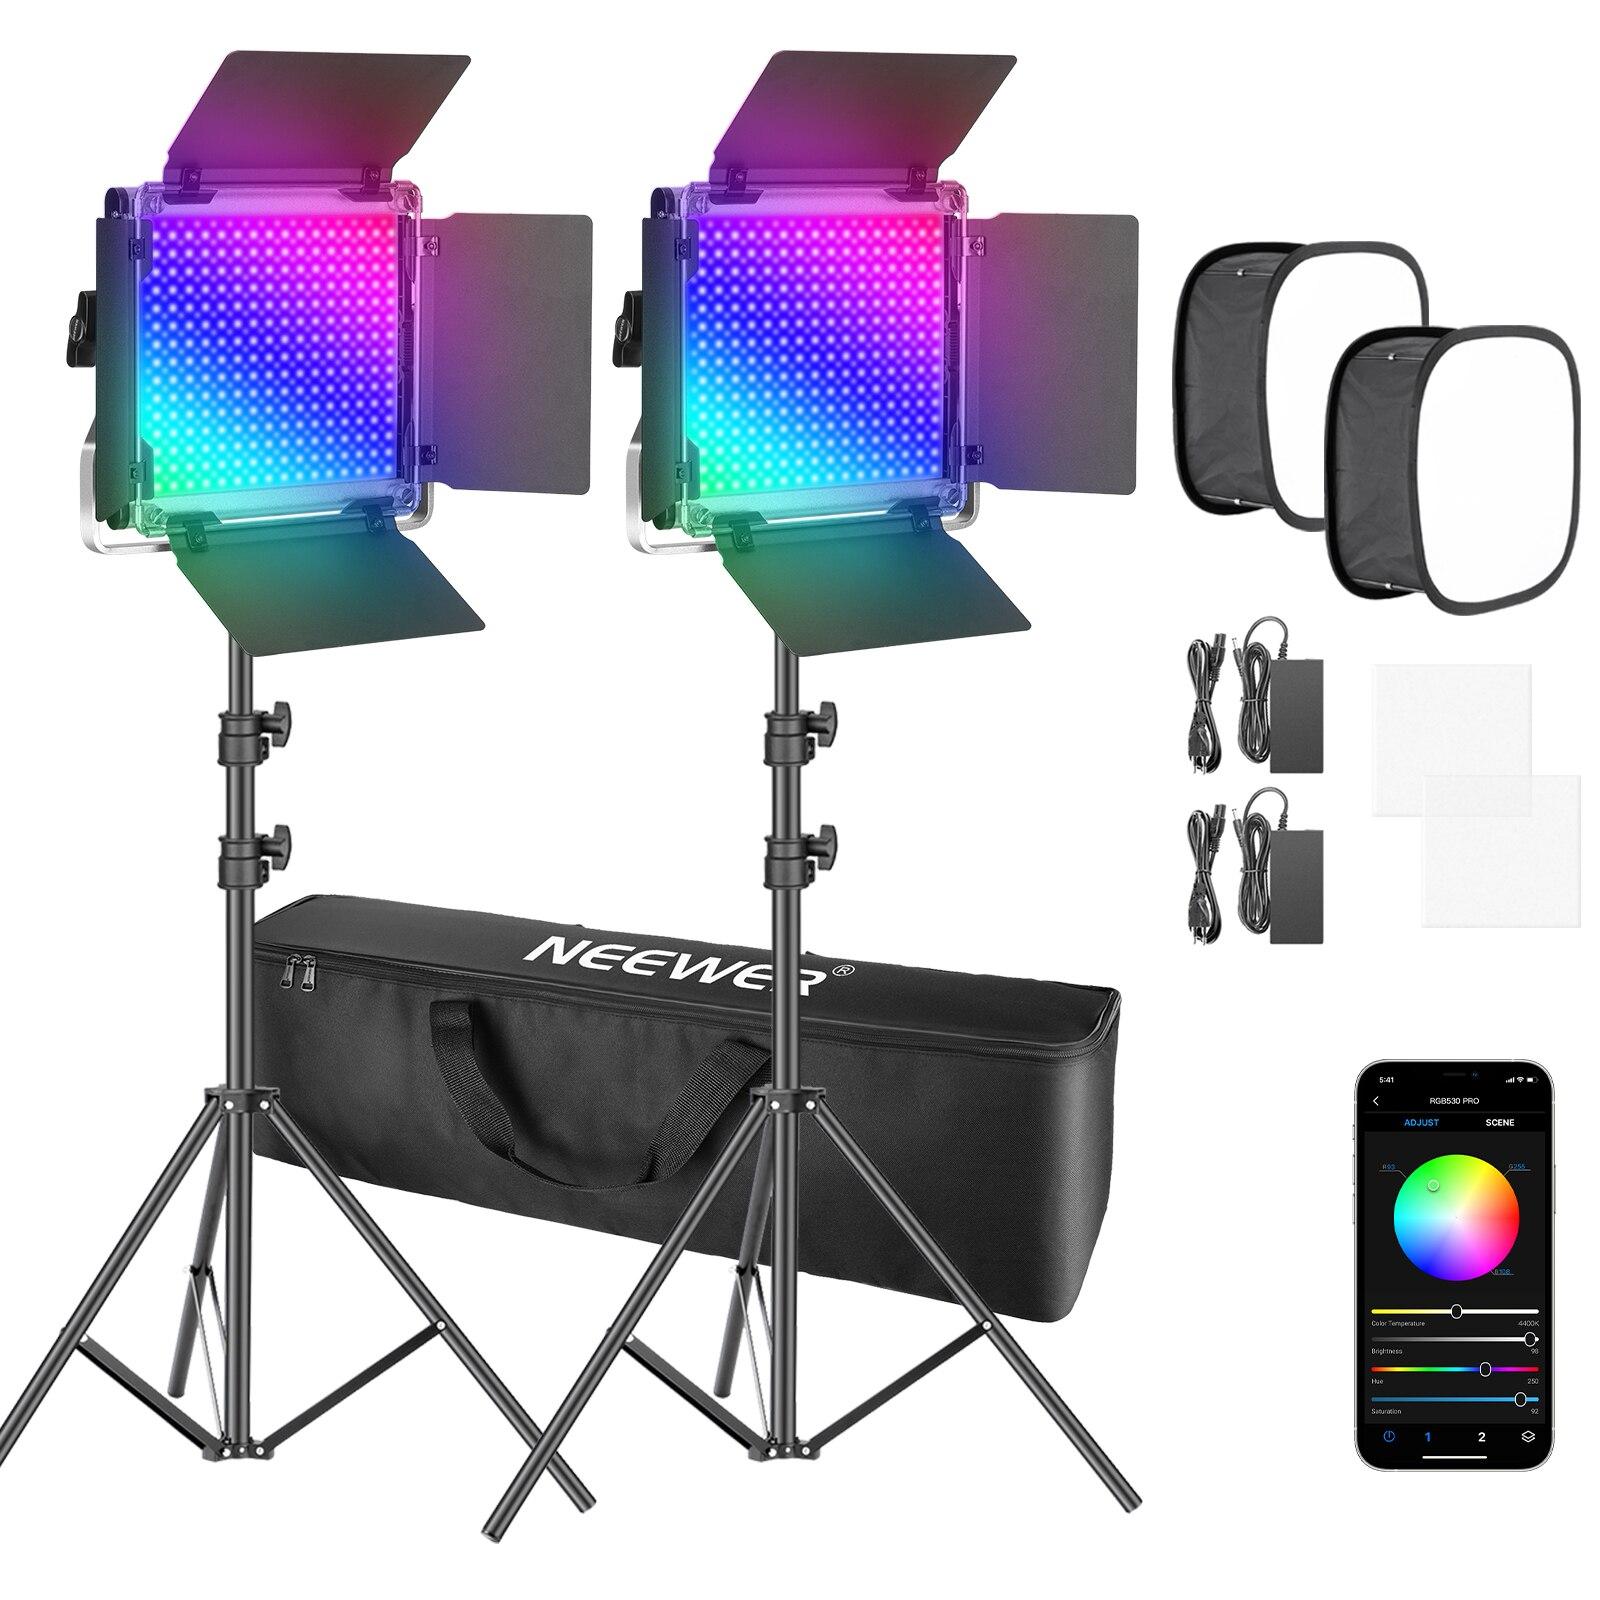 Neewer 2 حزم 530 برو RGB Led ضوء الفيديو مع APP التحكم الفوتوغرافي Softbox كيت ، 360 ° كامل اللون ، 45W فيديو الإضاءة CRI 97 + ل يوتيوب